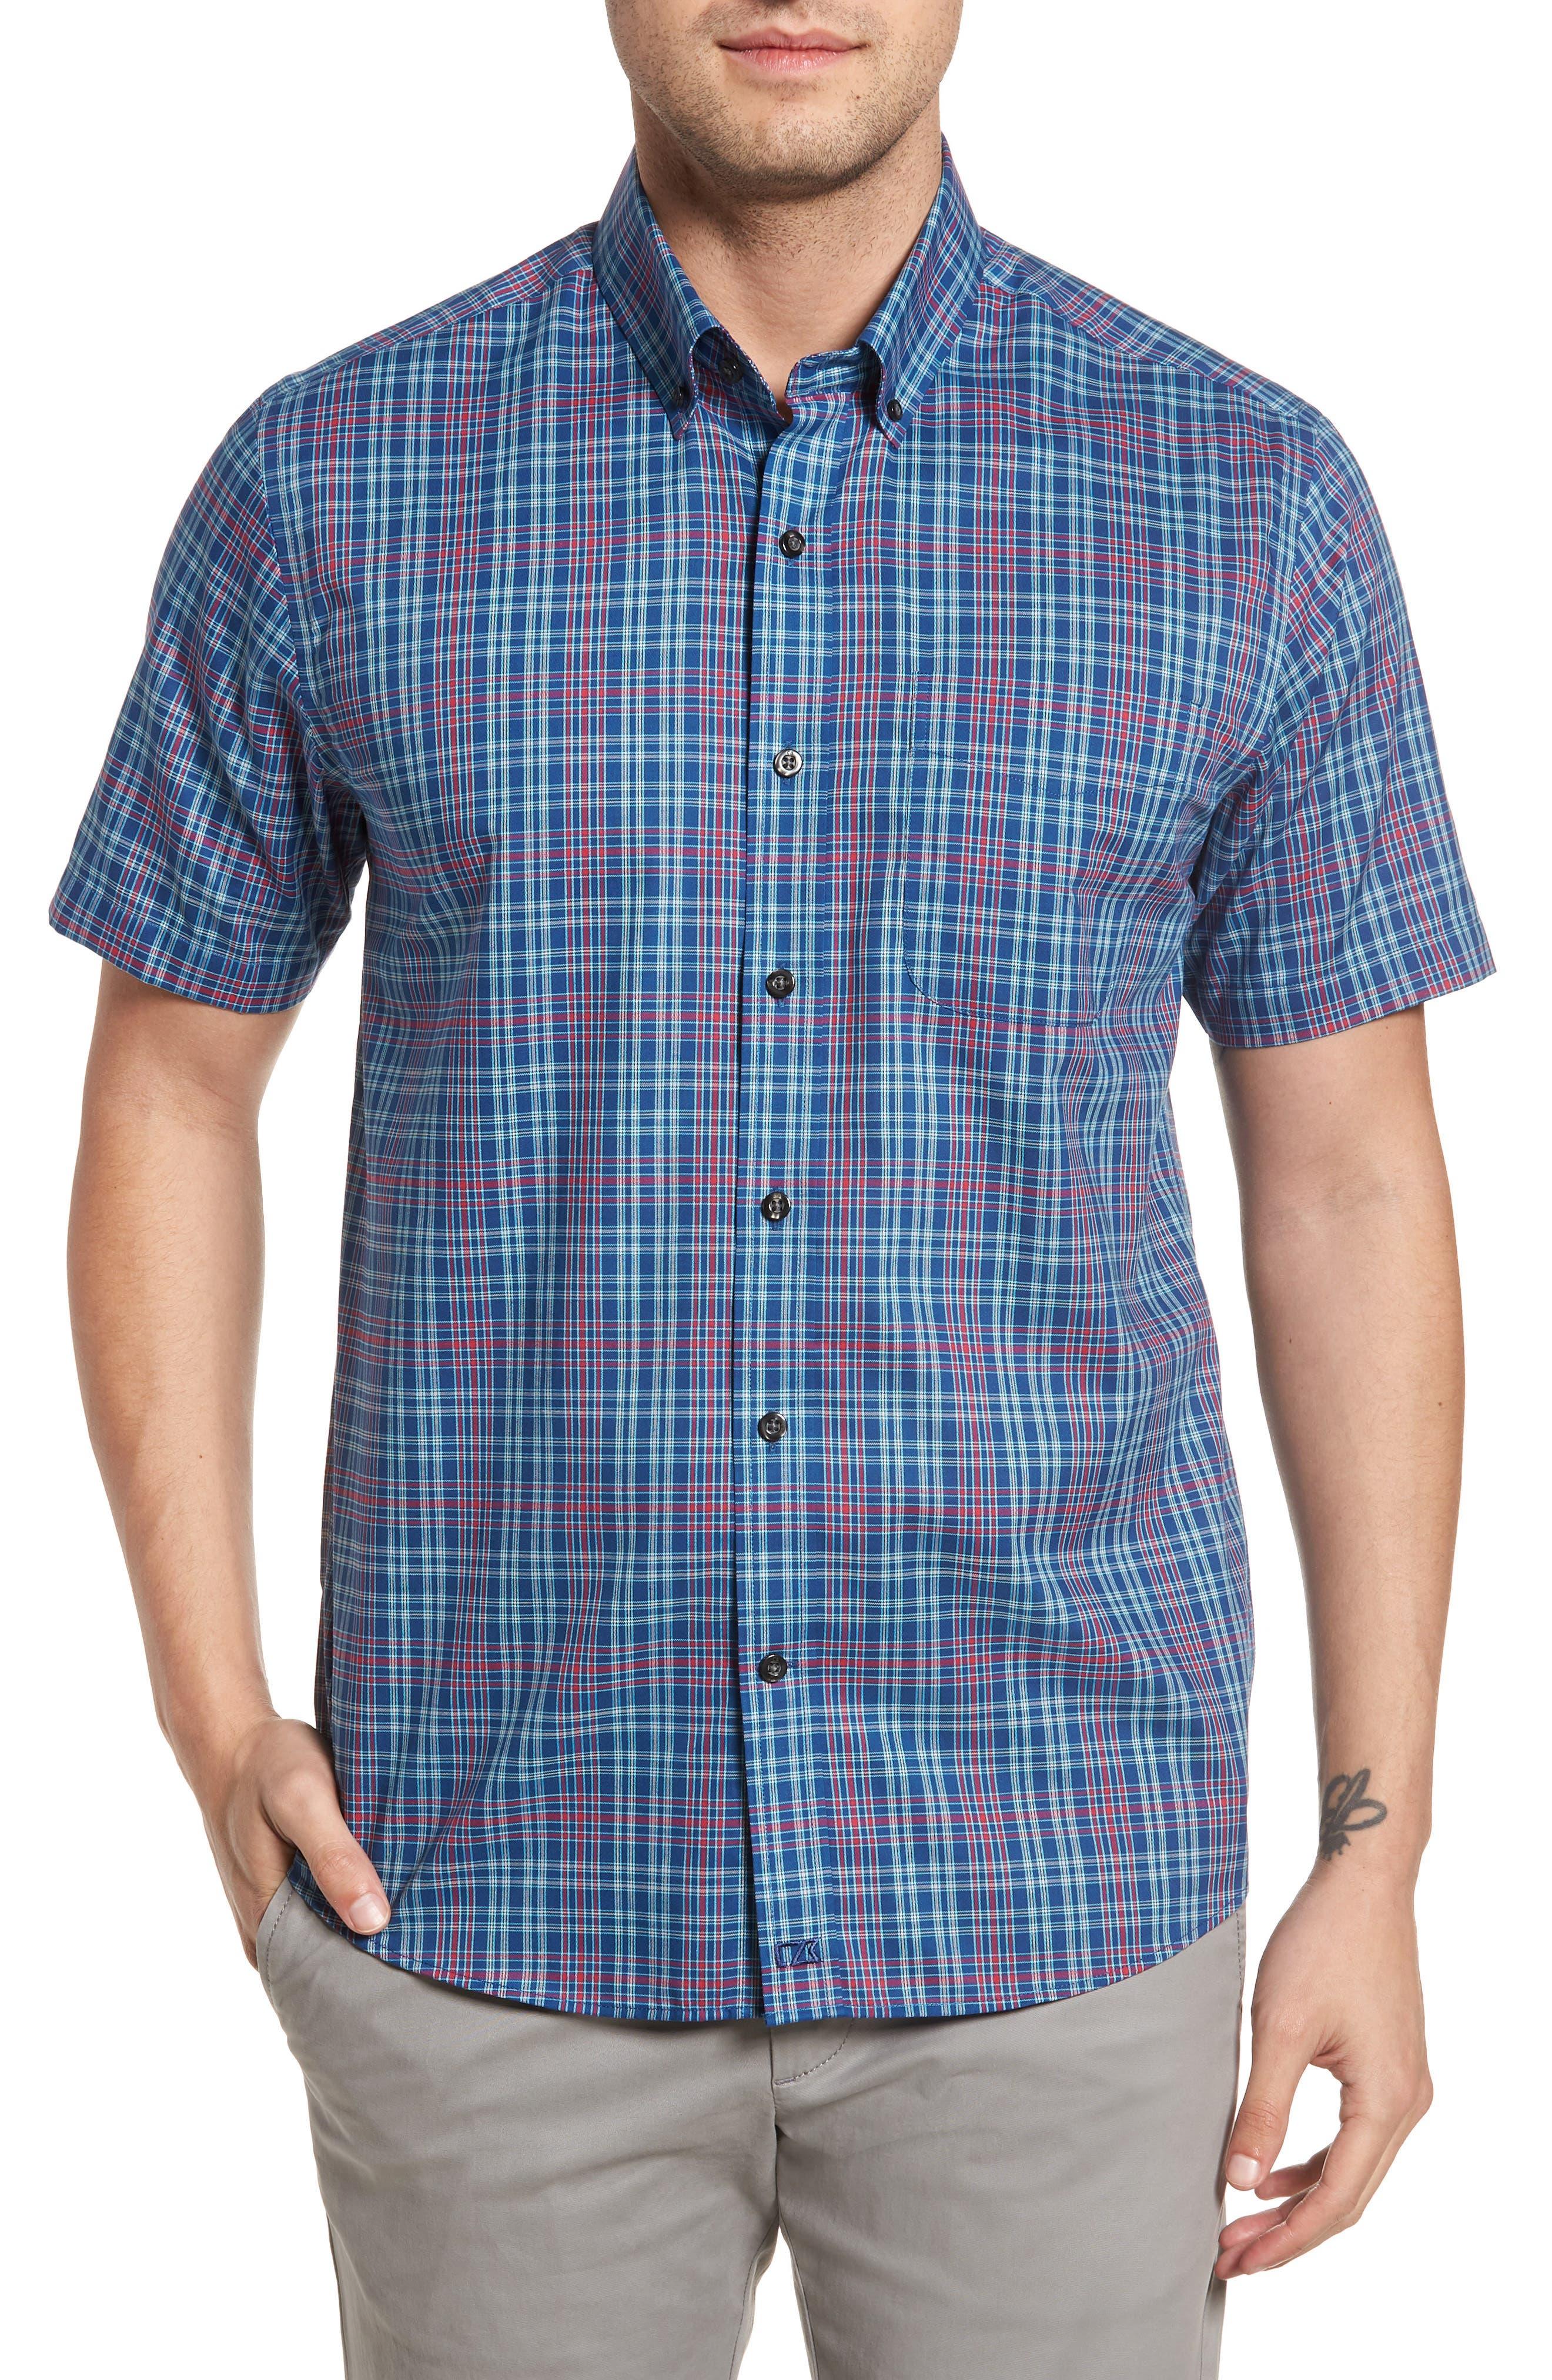 Isaac Plaid Easy Care Woven Shirt,                             Main thumbnail 3, color,